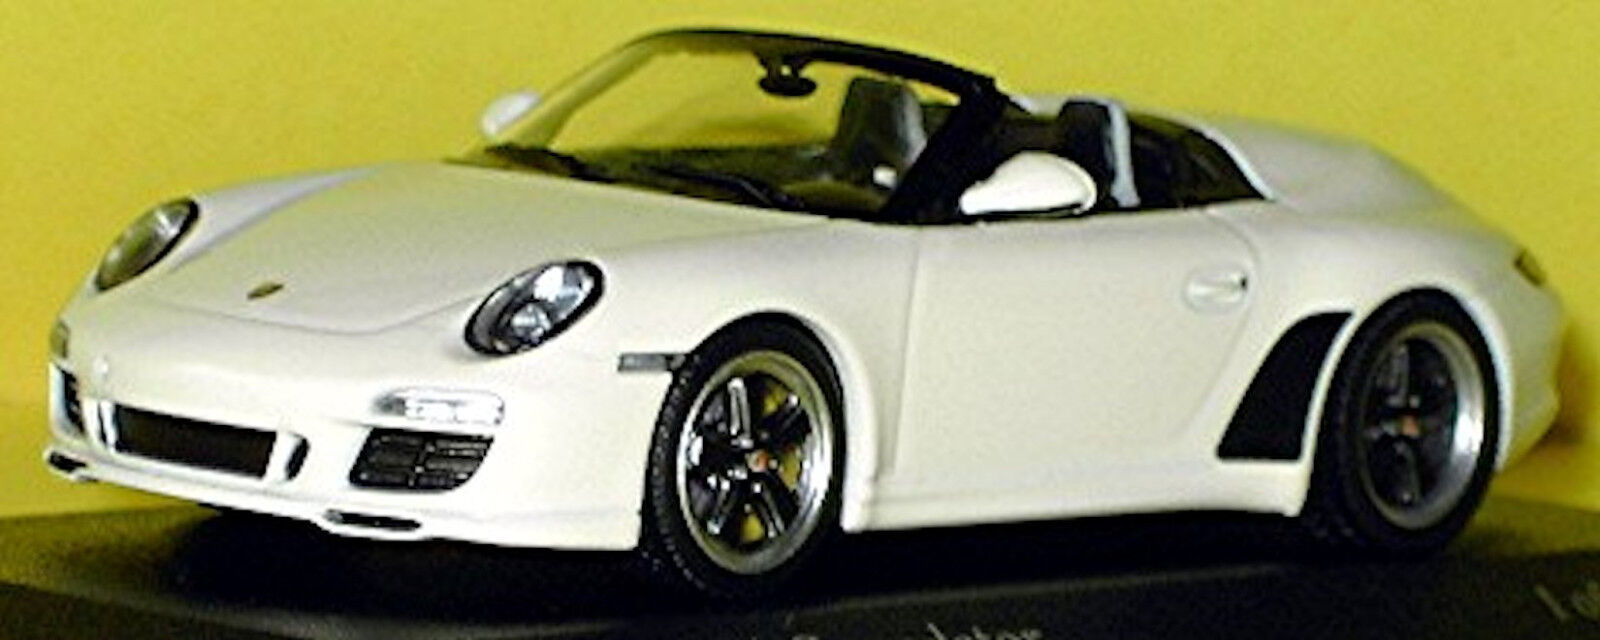 PORSCHE 911 SPEEDSTER typ 997 II 2010-11 Carrera Blanc blanc 1 43 Minichamps